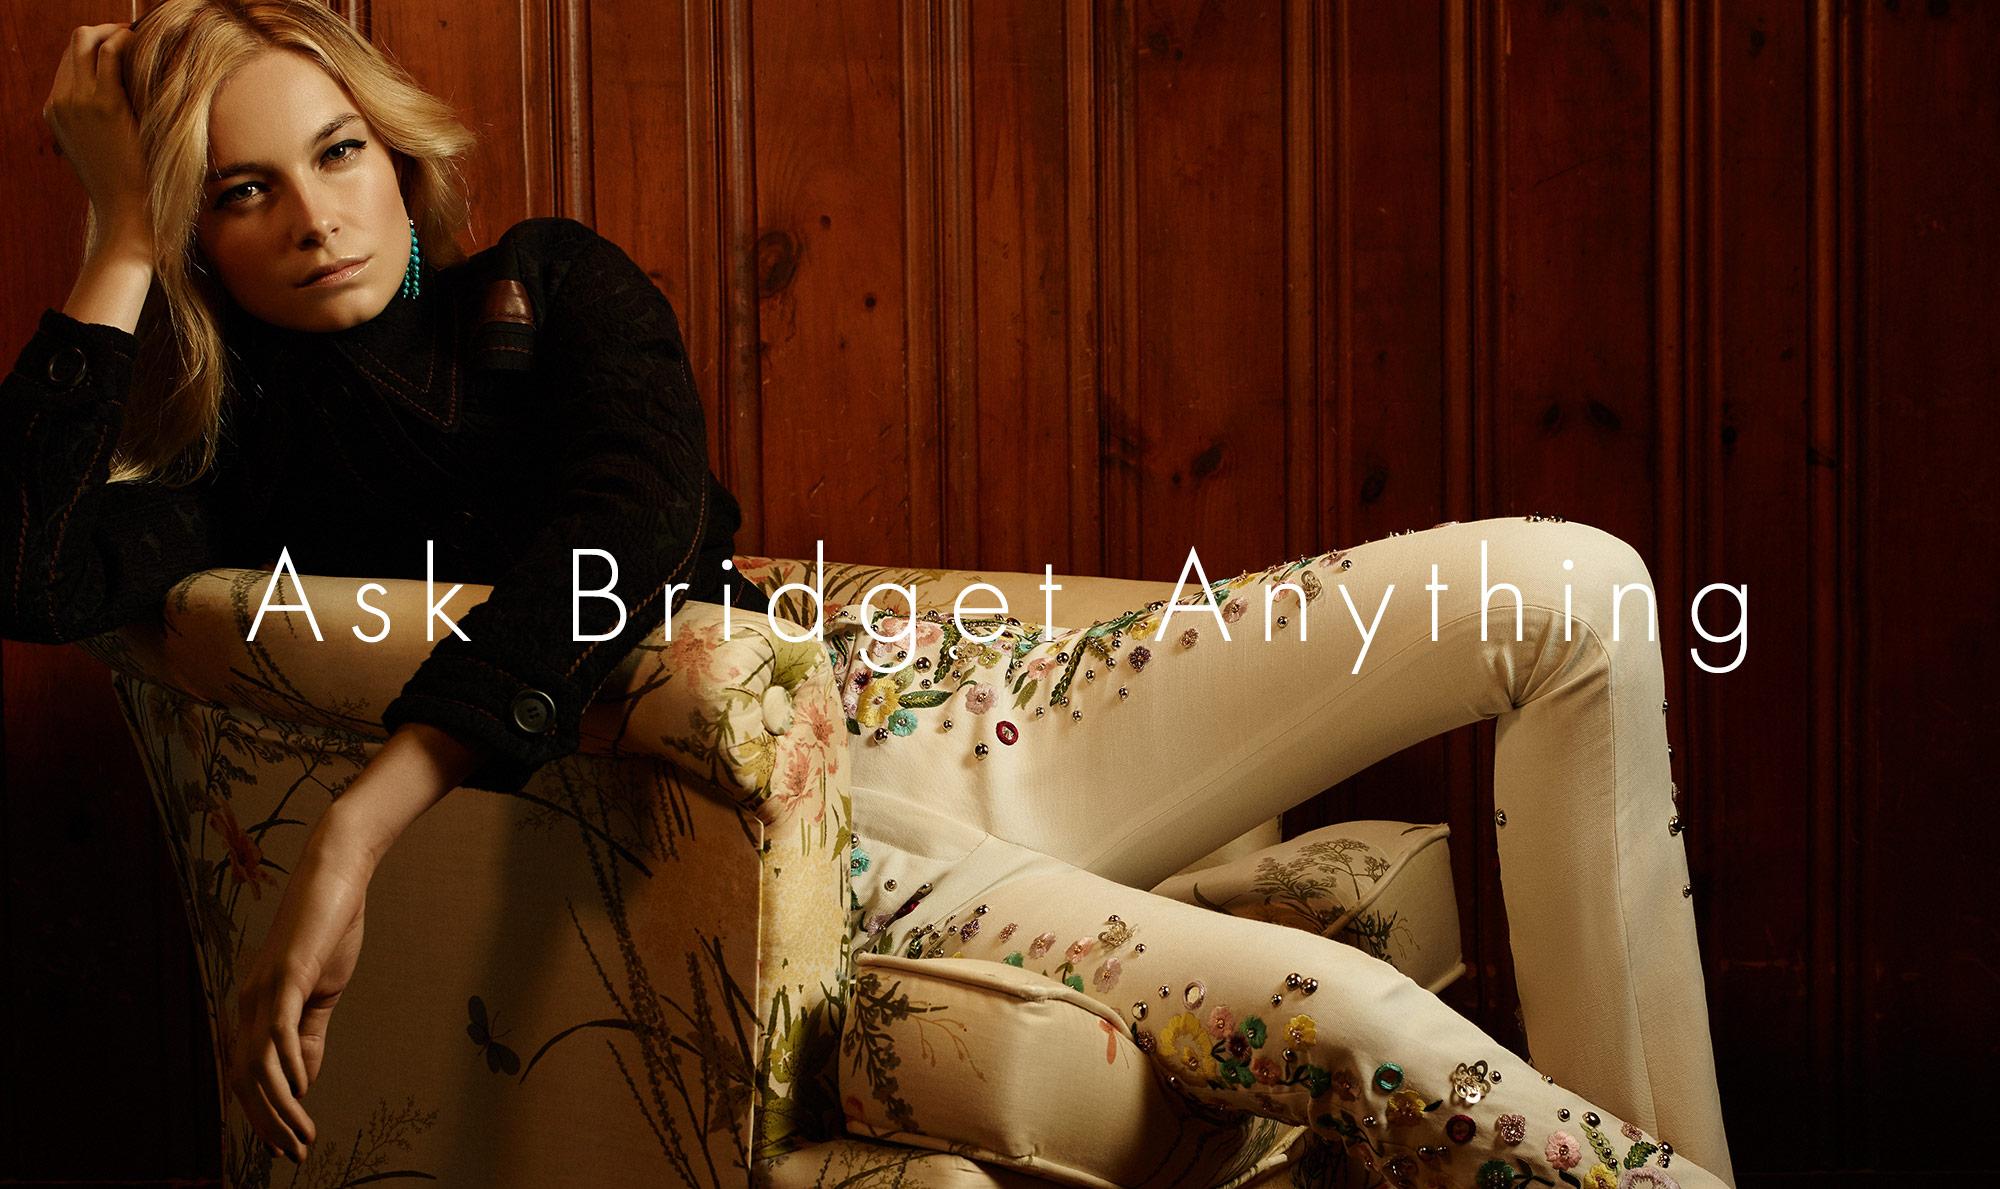 BRIDGET-ASK-Bridget-ANYTHING.jpg